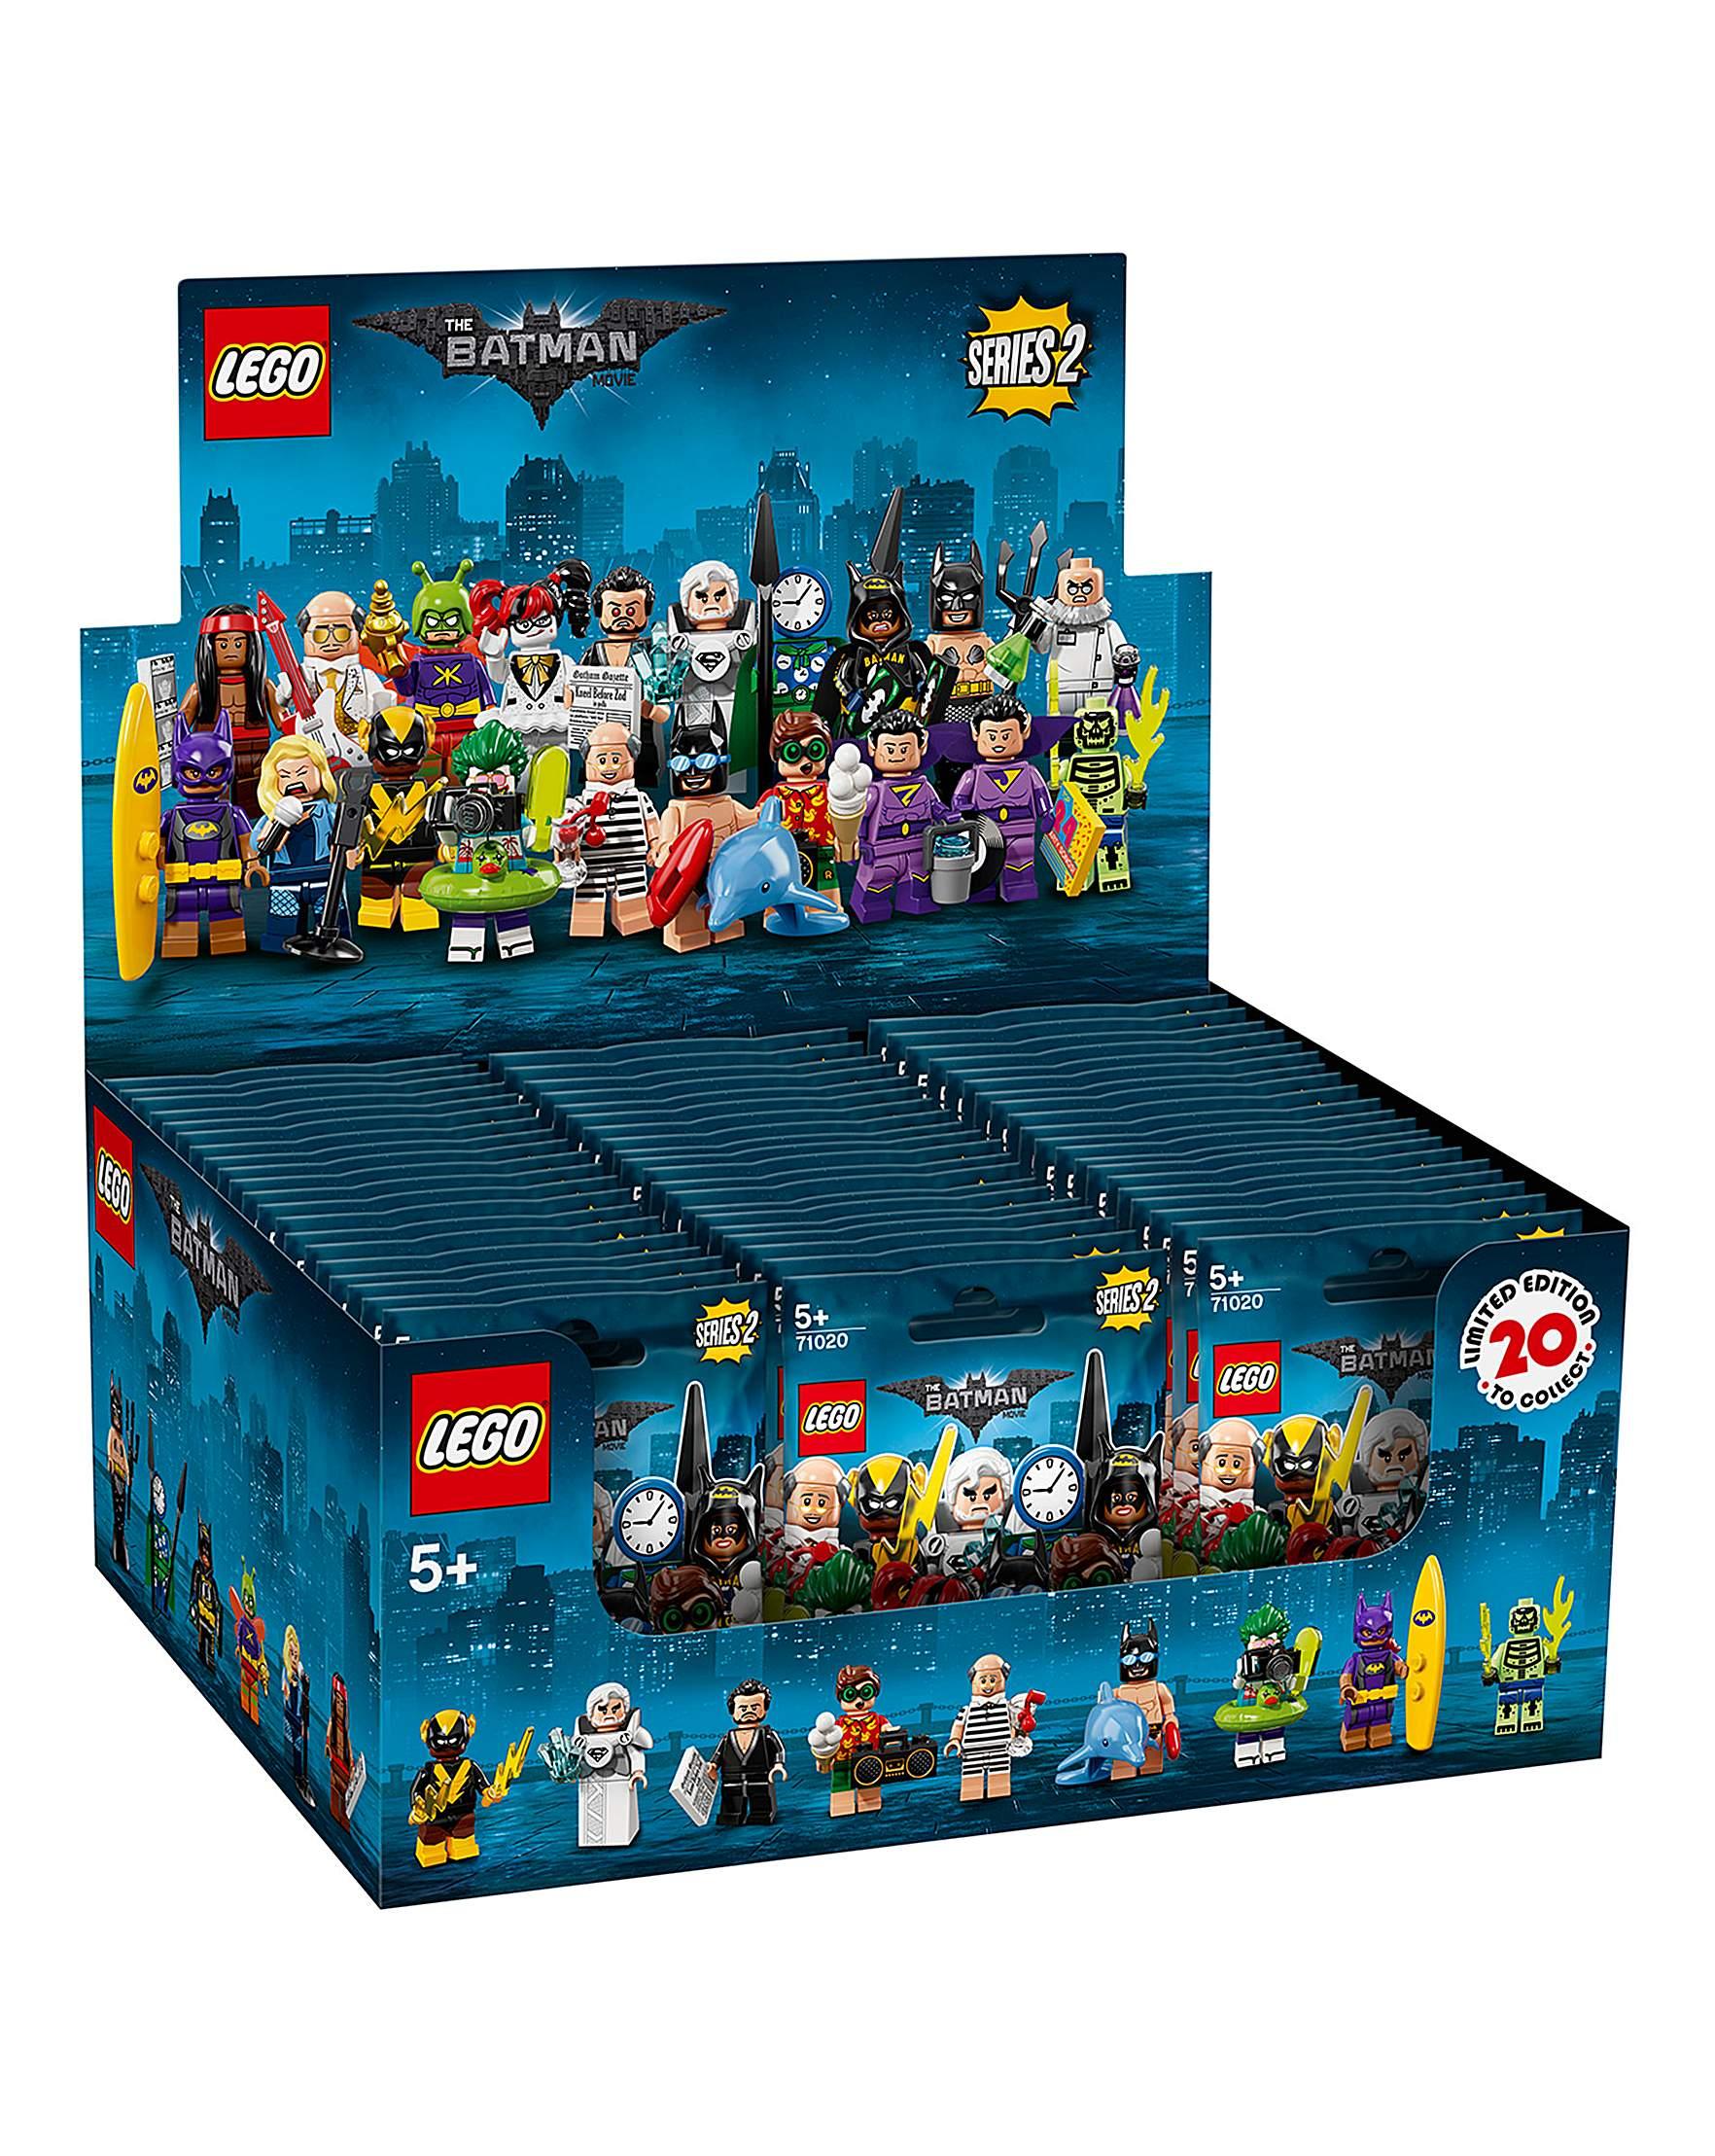 71020 The LEGO Batman Movie Series 2